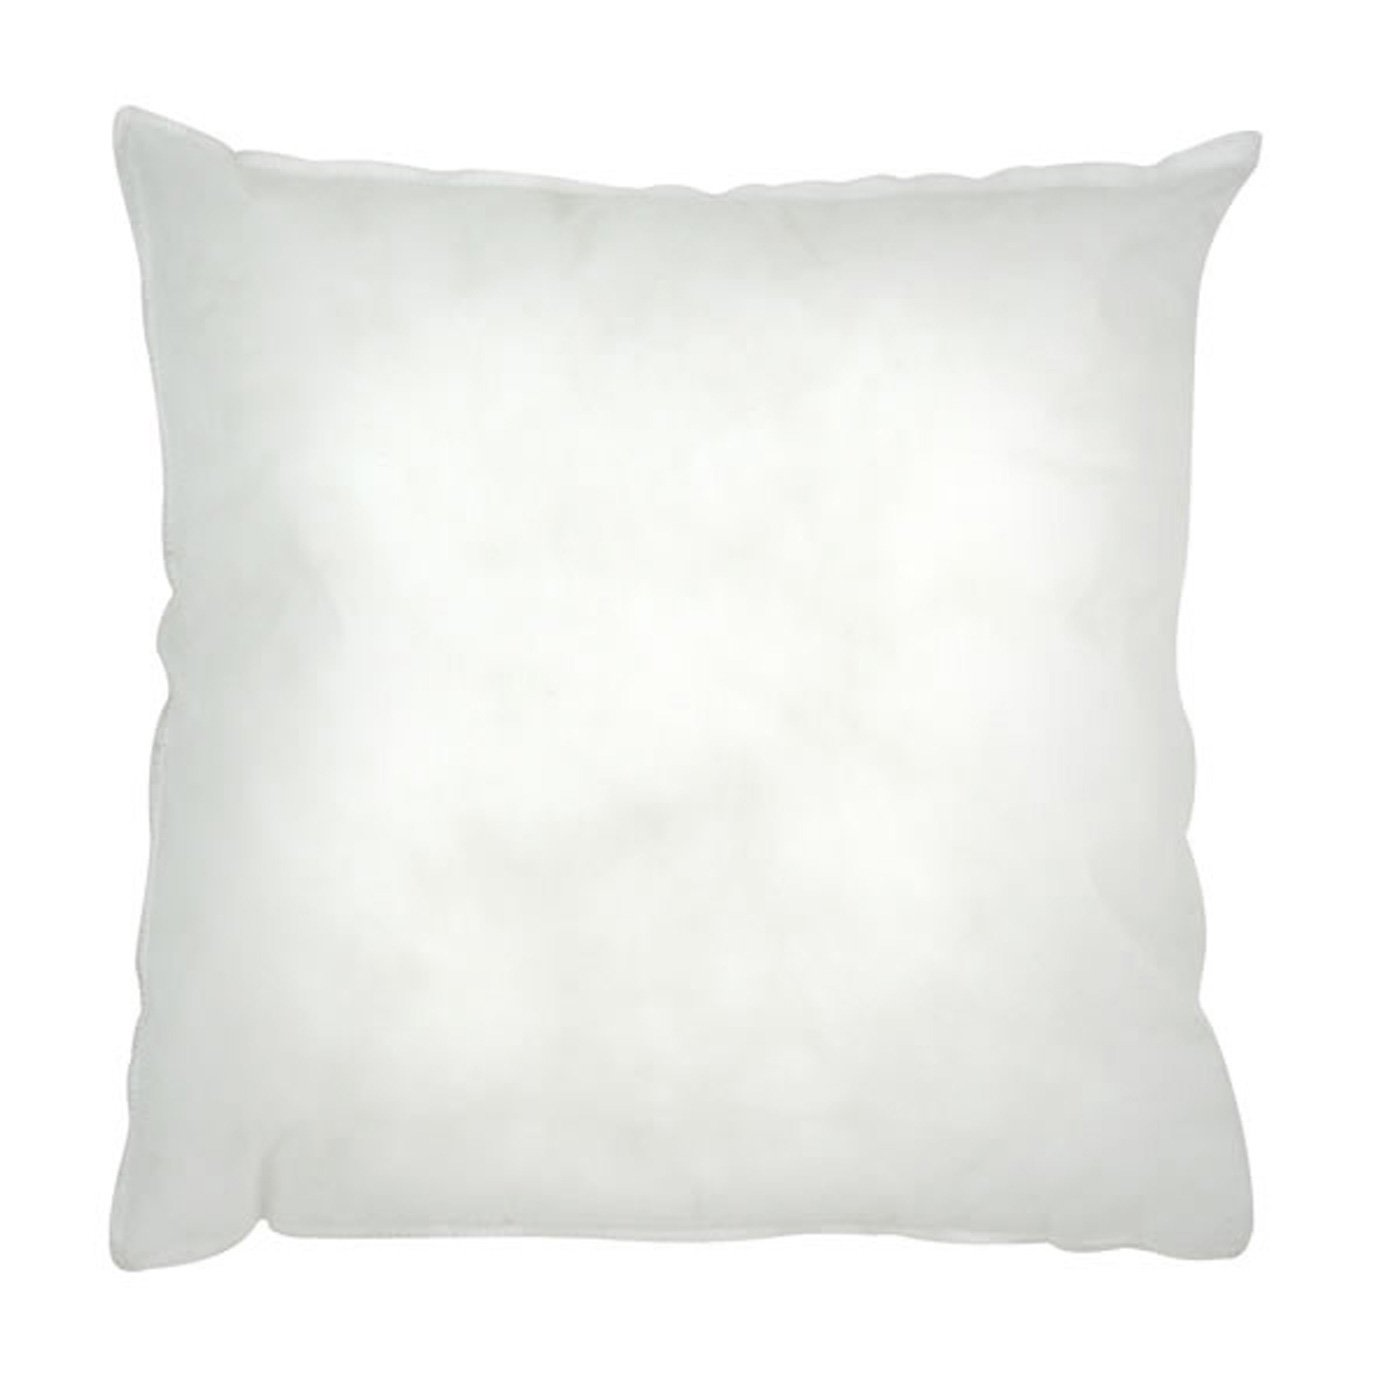 Riva Home - Imbottitura per Cuscini in Poliestere (30x30cm) (Bianco) UTRV324_3